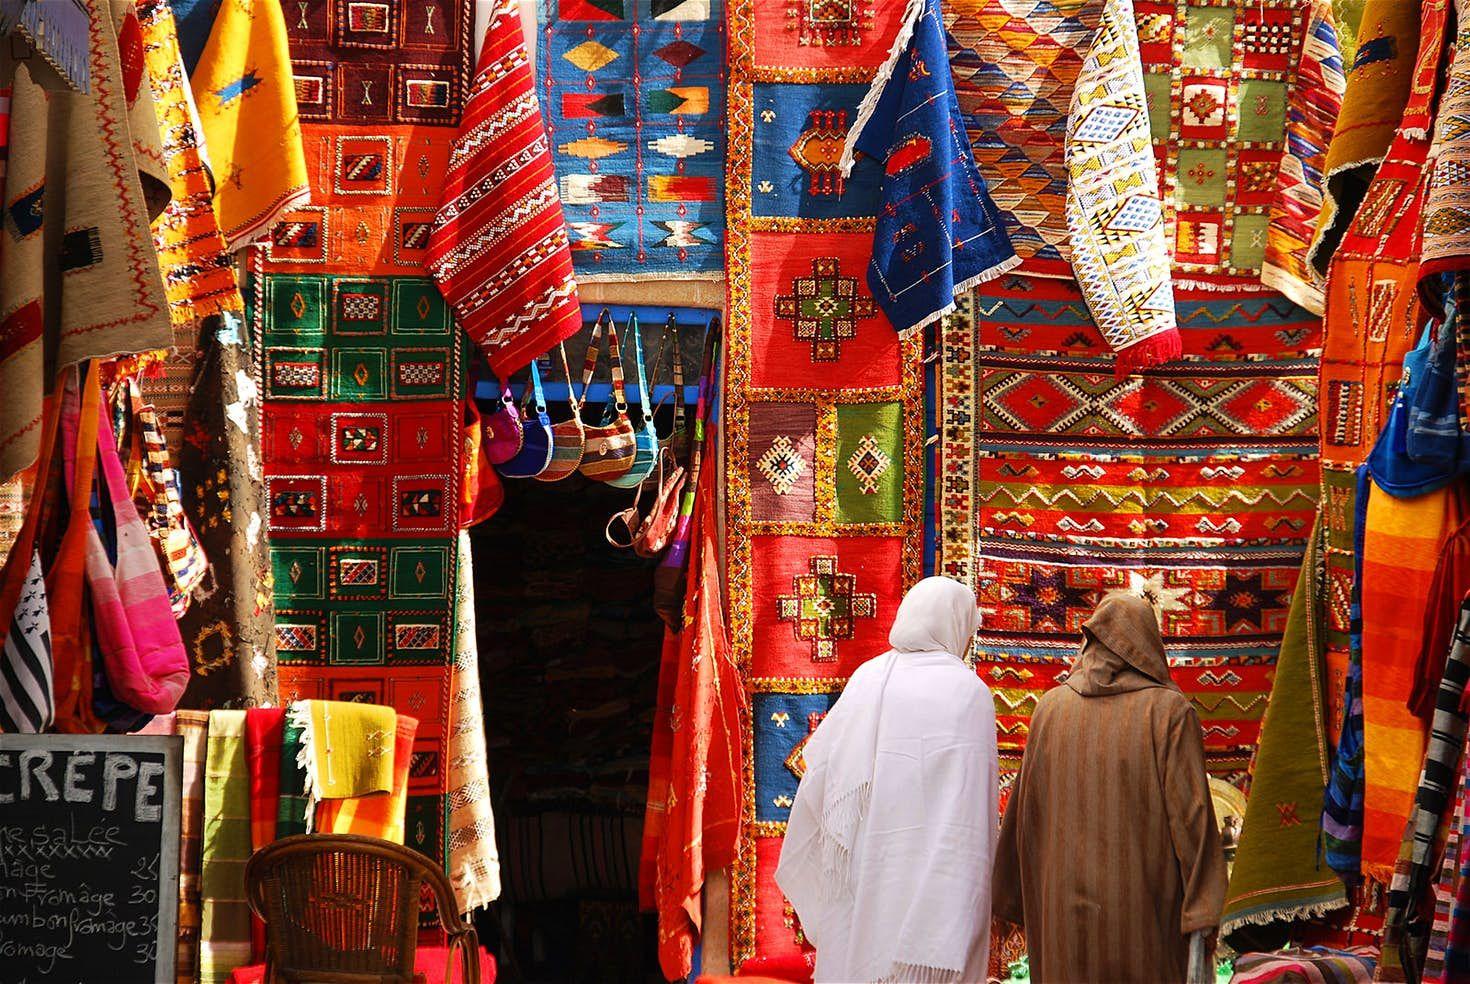 Shopping In Essaouira Morocco Where To Buy What Morocco Morocco Travel Marrakech